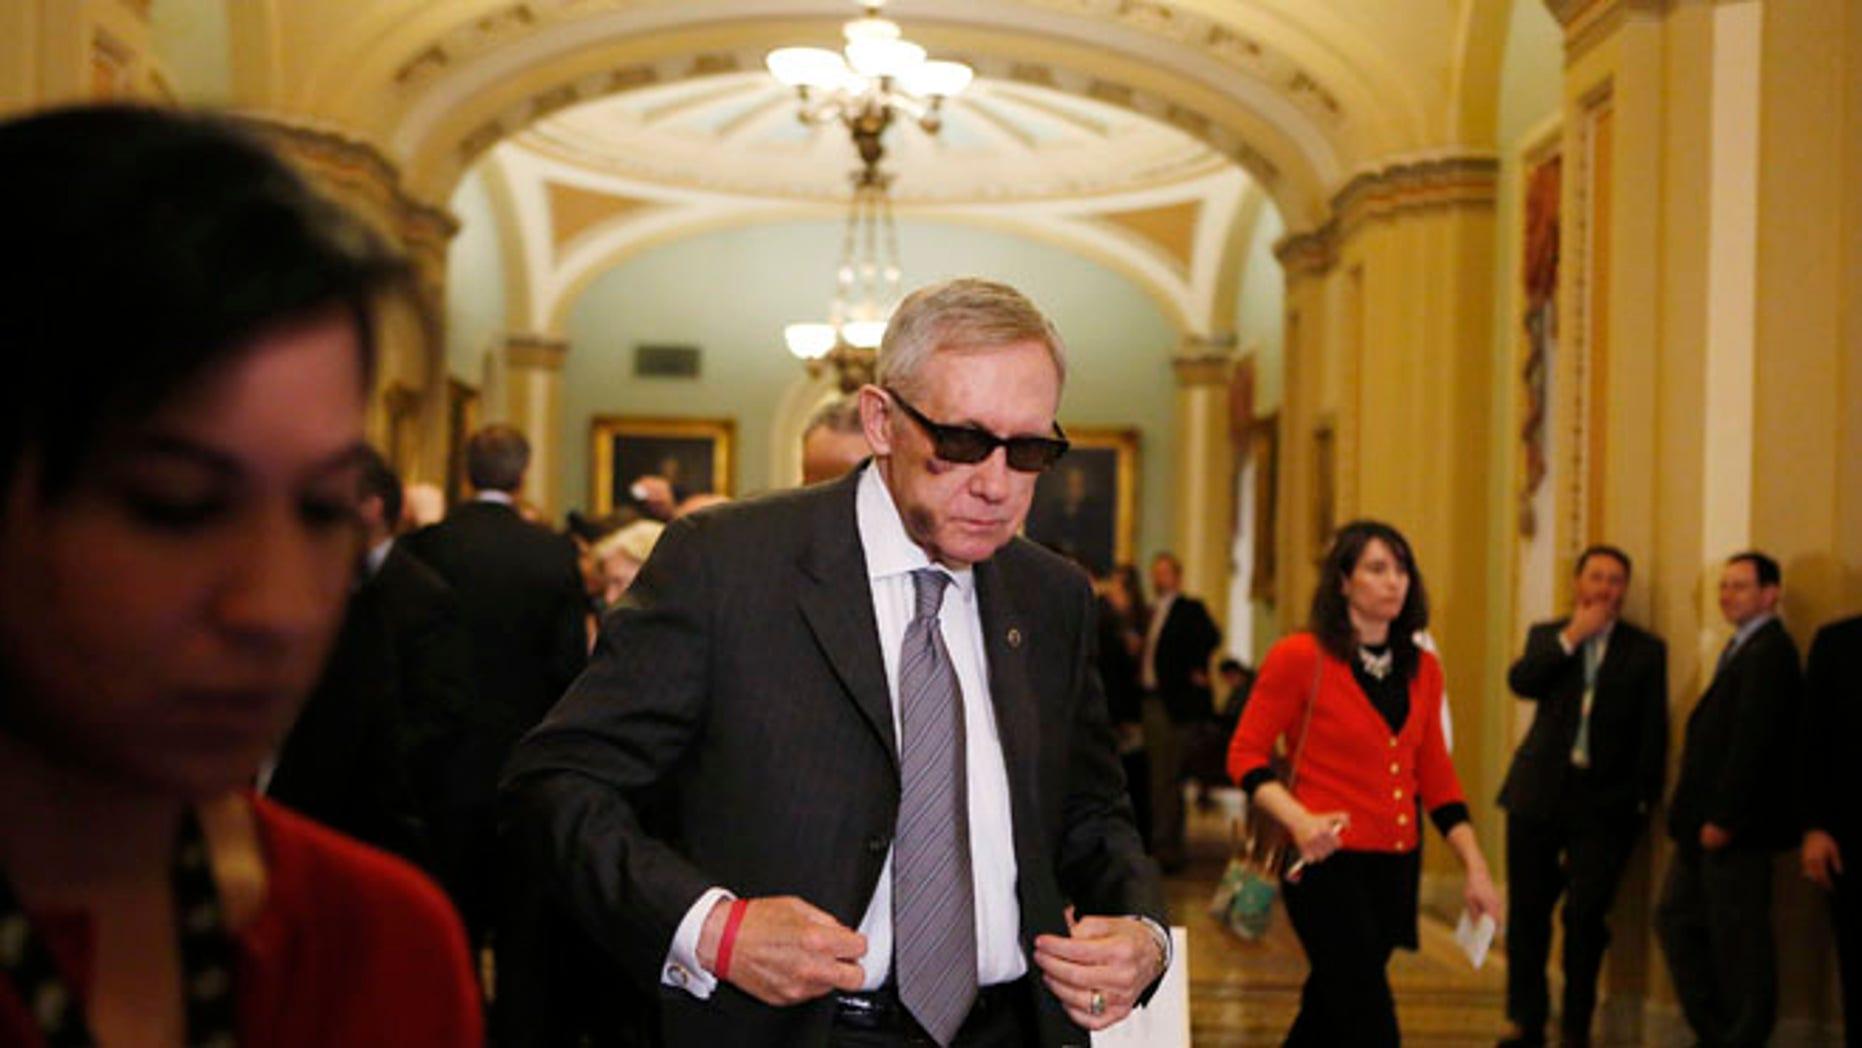 FILE: Feb. 24, 2015: Senate Minority Leader Harry Reid, D-Nevada, on Capitol Hill, in Washington, D.C.